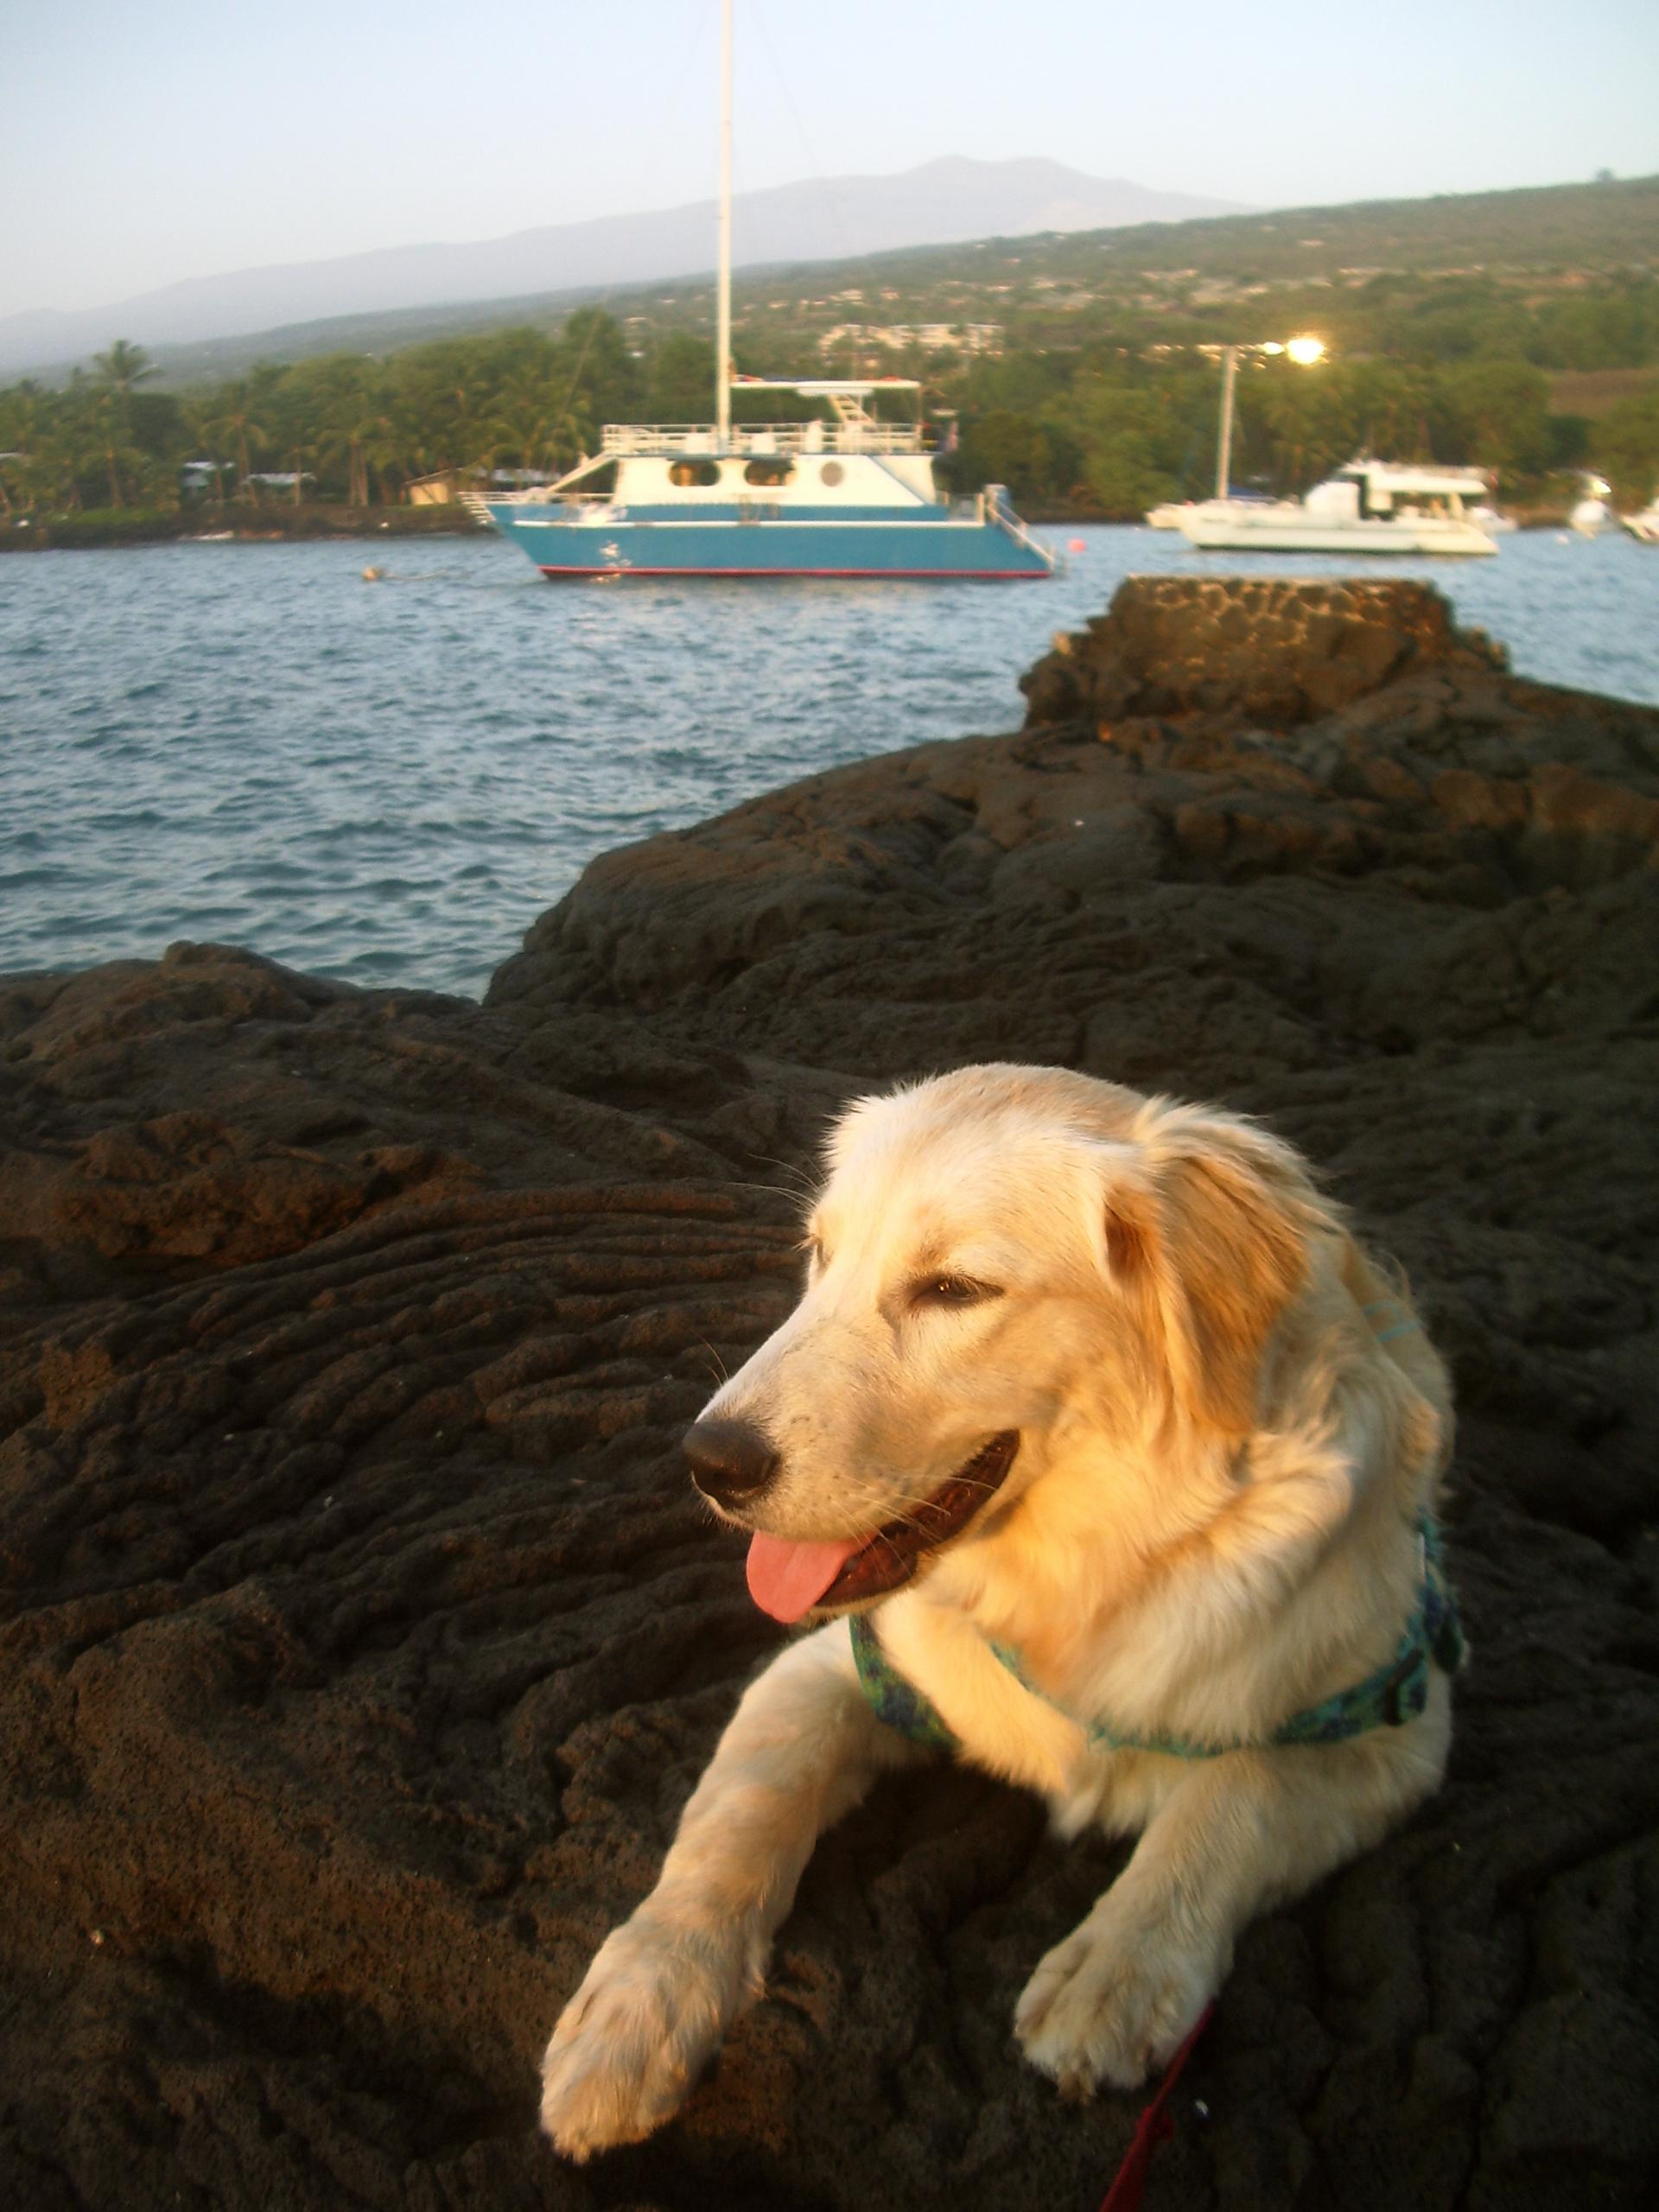 Trogdor at Keauhou Bay, Kona Hawaii: Photo by Donnie MacGowan